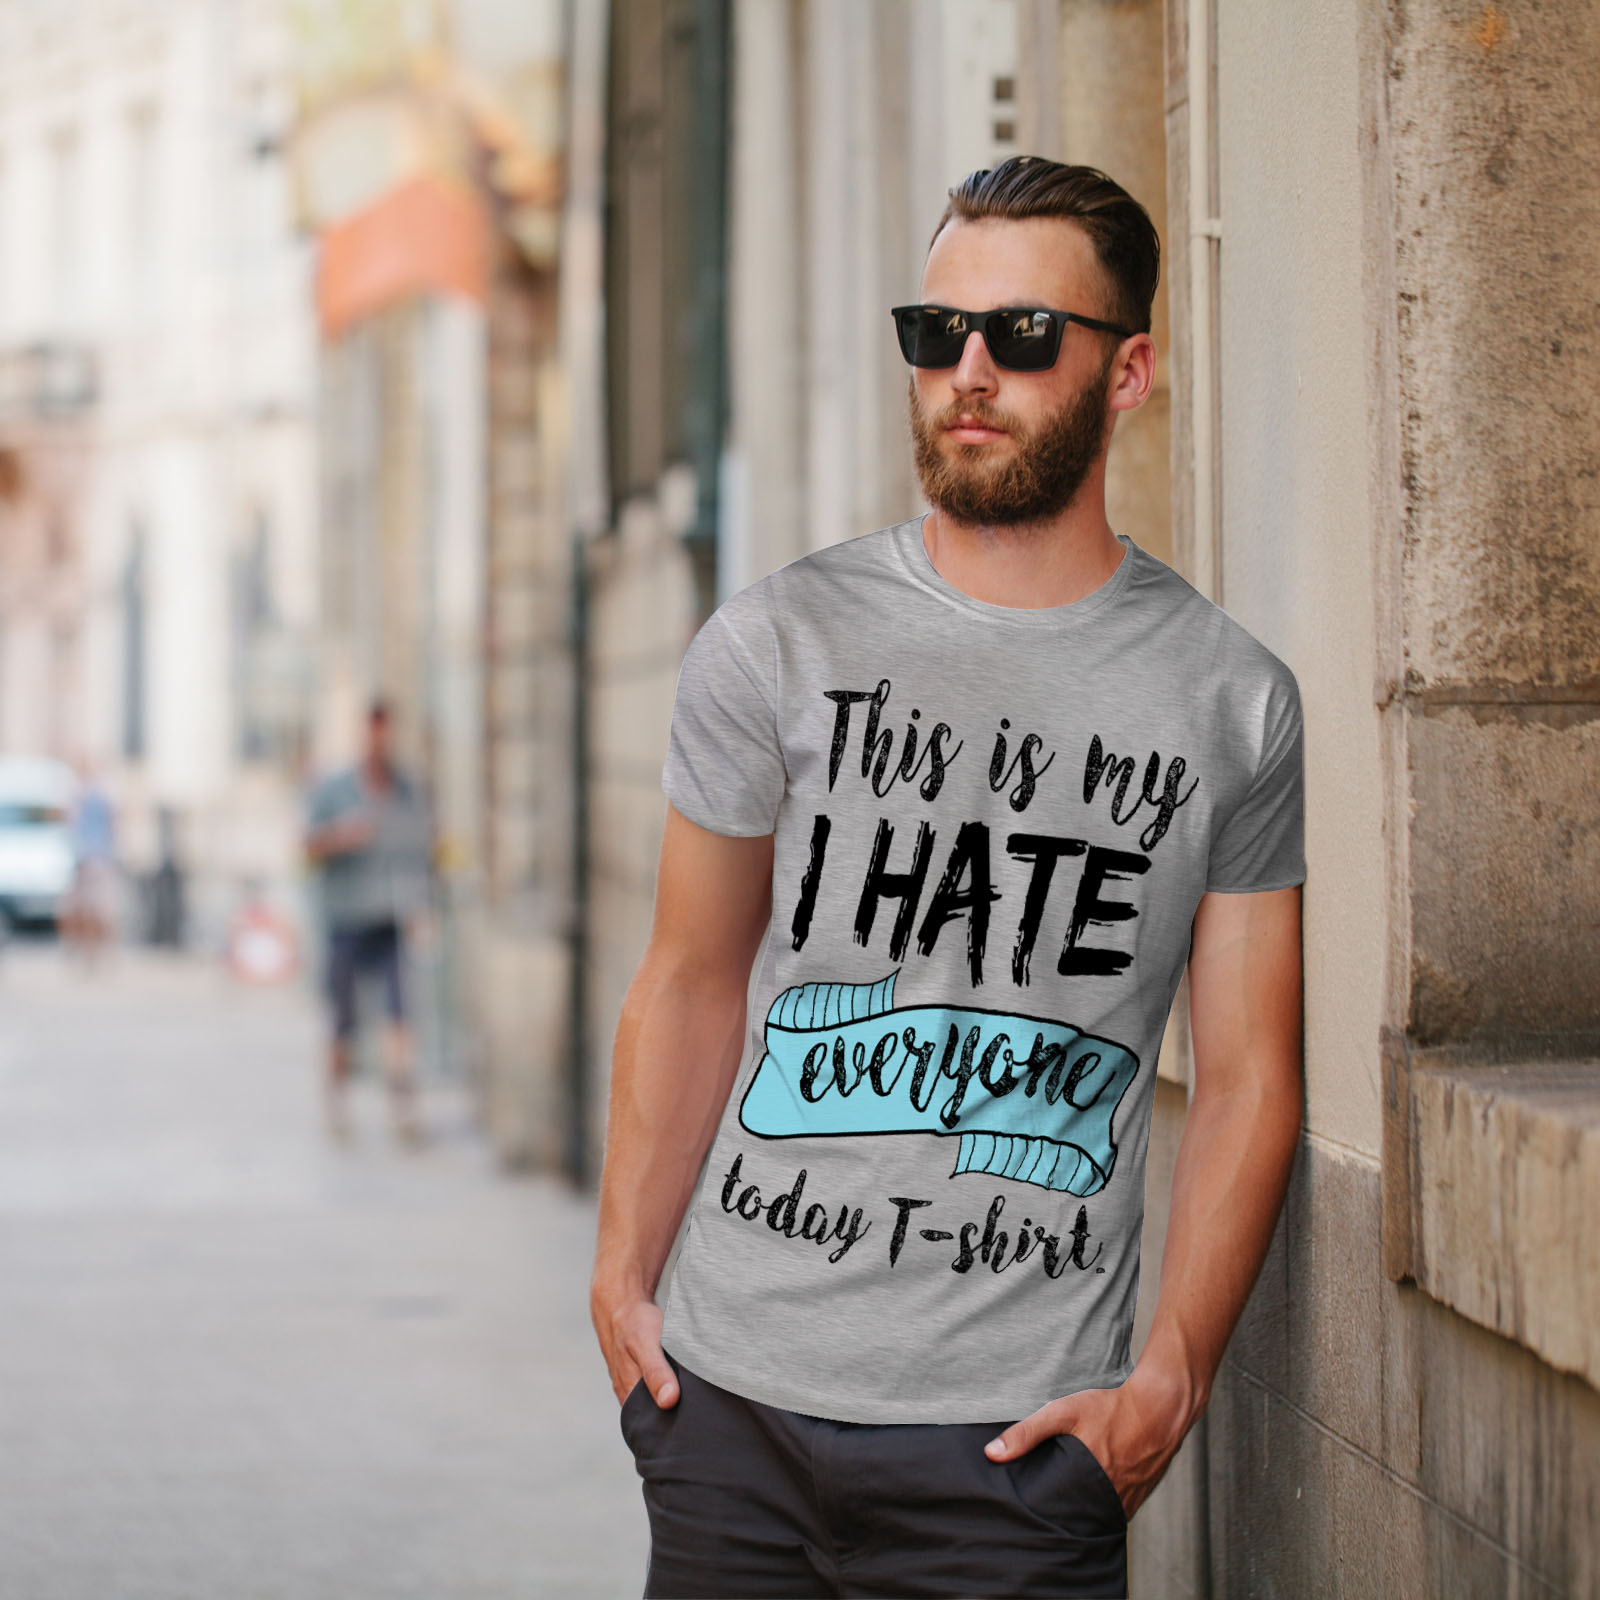 Wellcoda-hasse-alle-heute-Herren-T-Shirt-lustige-Grafikdesign-Printed-Tee Indexbild 17